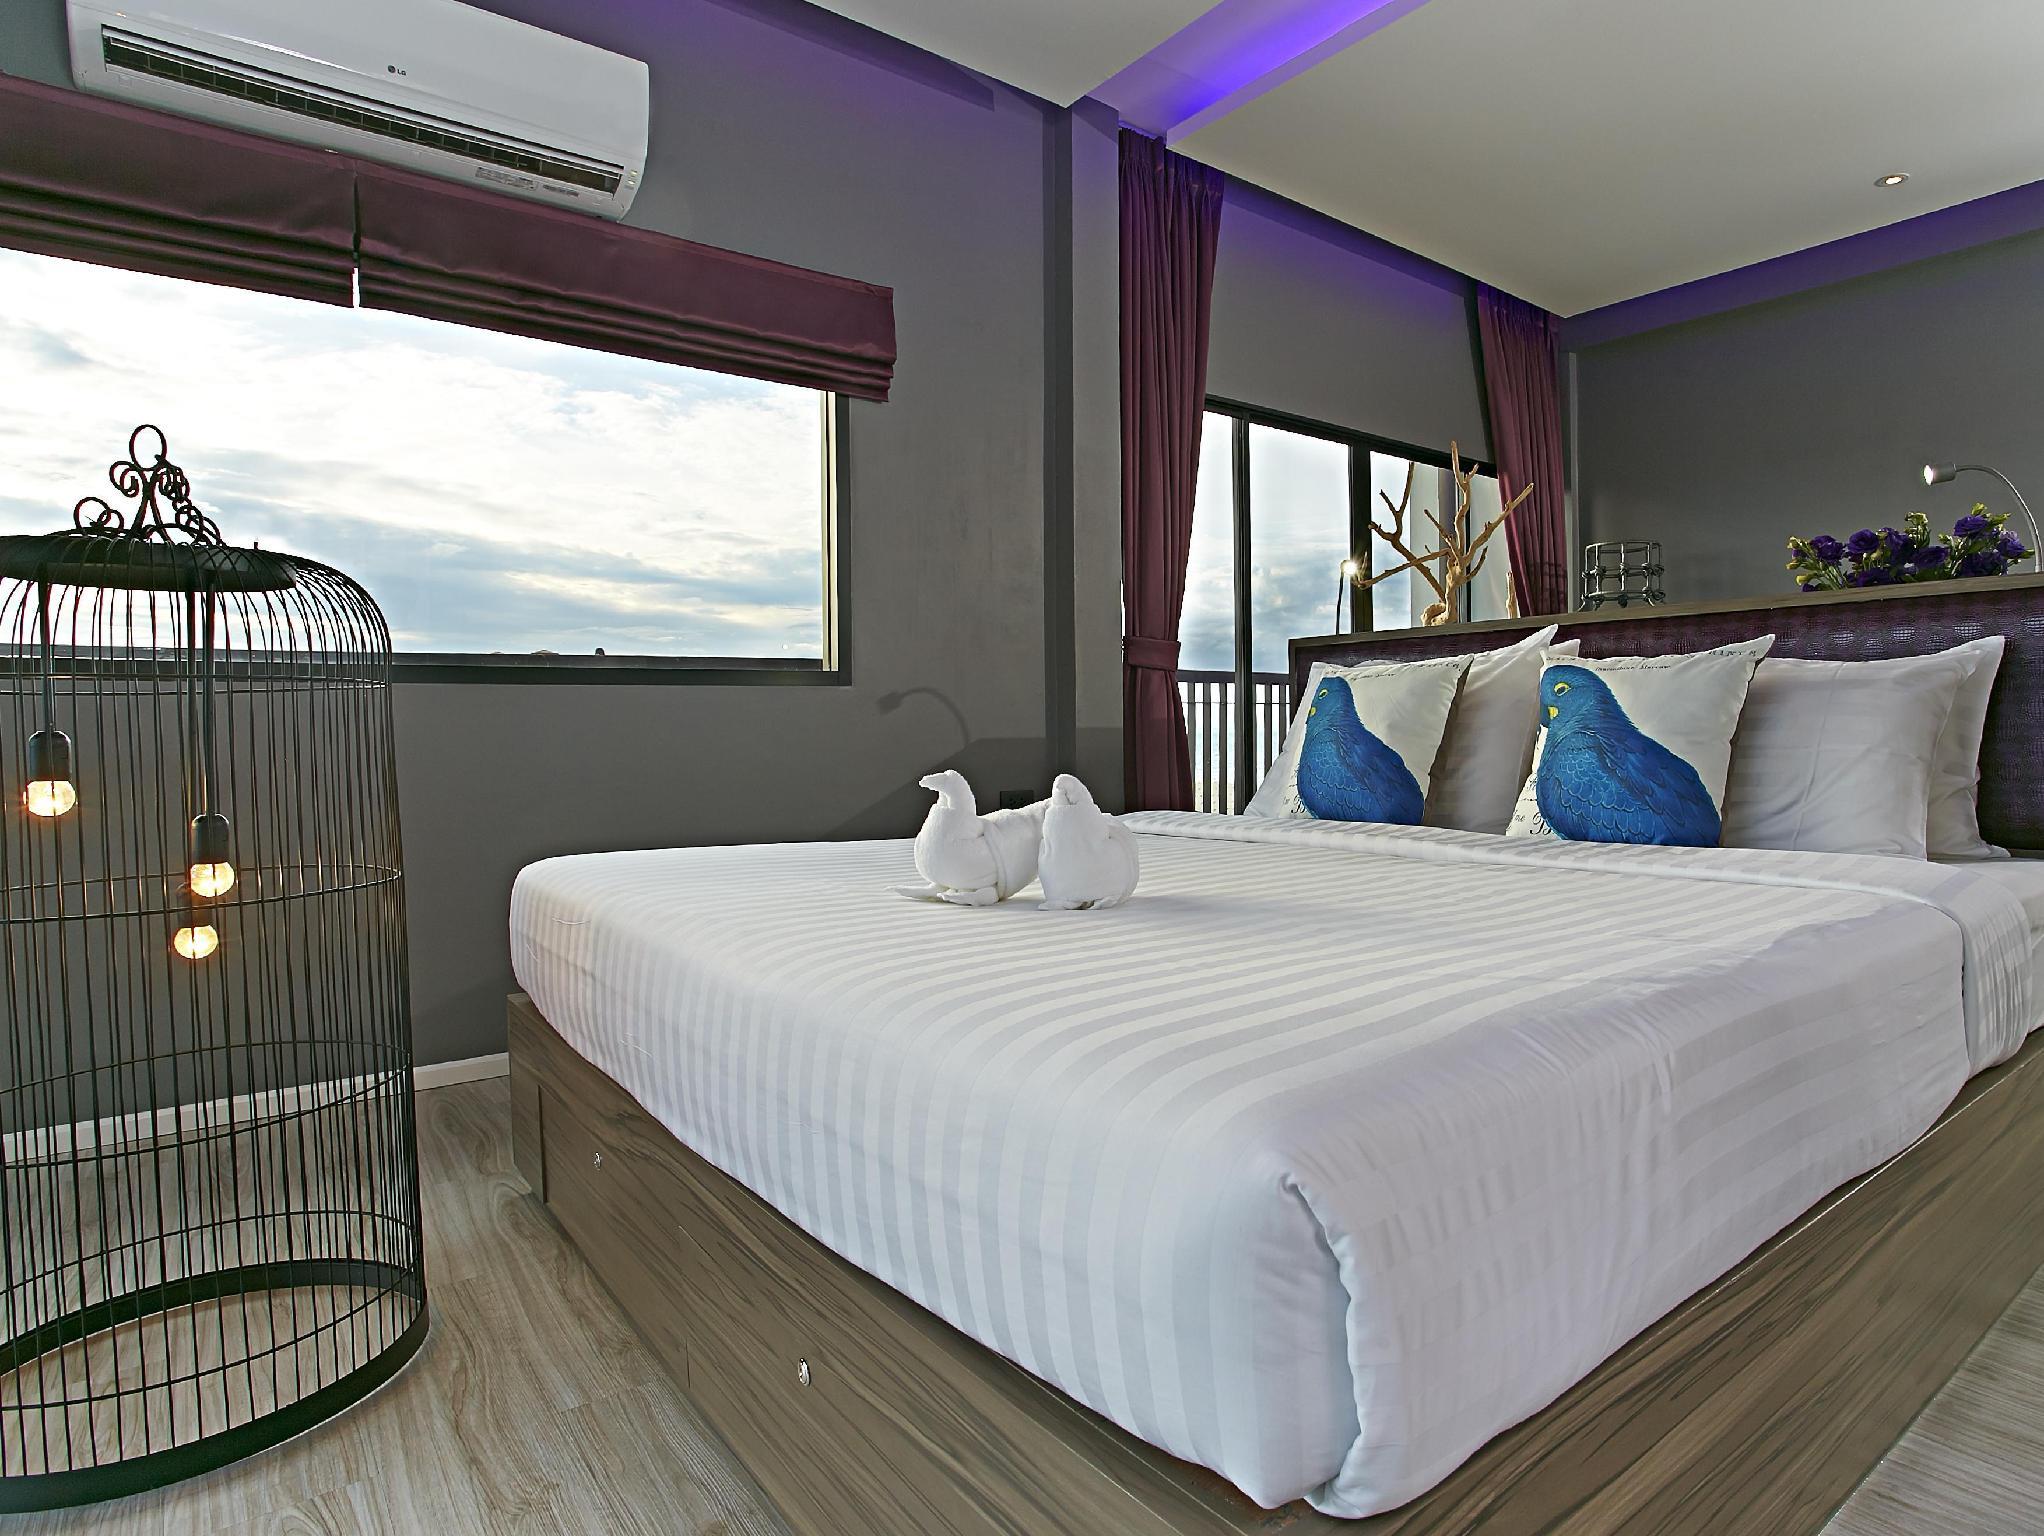 The Weekend Pattaya